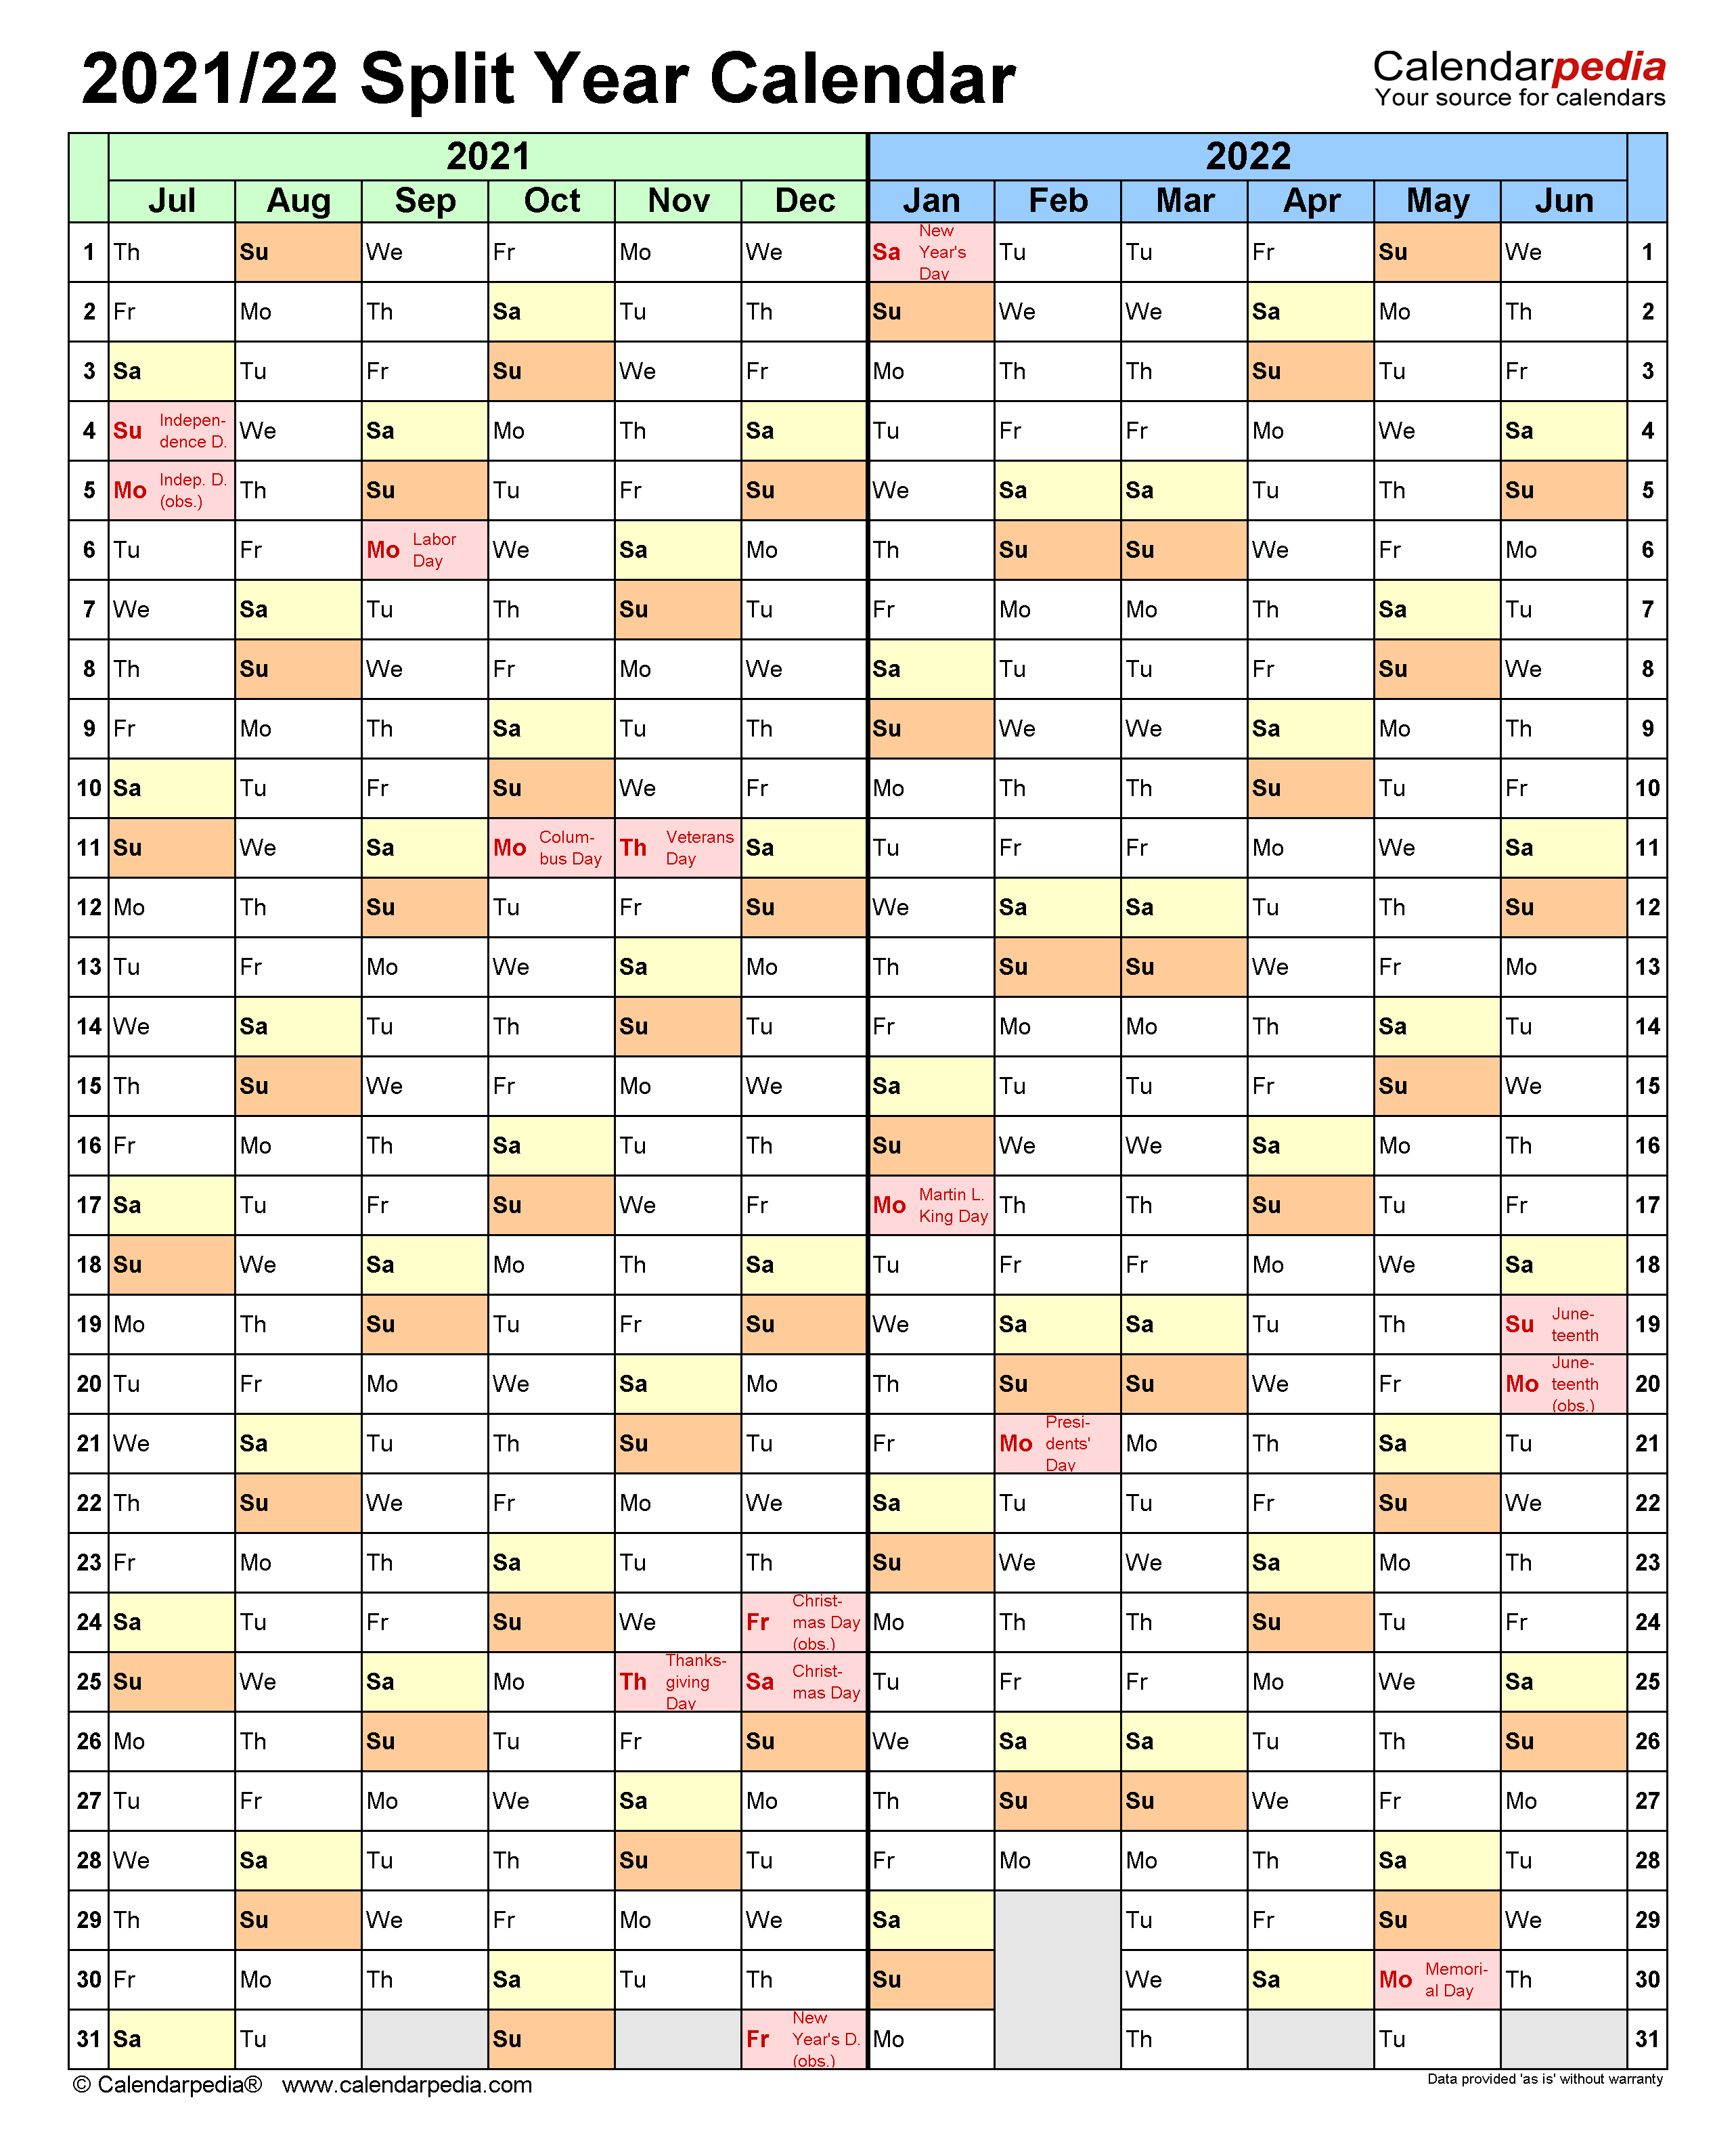 Uml Calendar Spring 2022.Split Year Calendars 2021 2022 July To June Pdf Templates